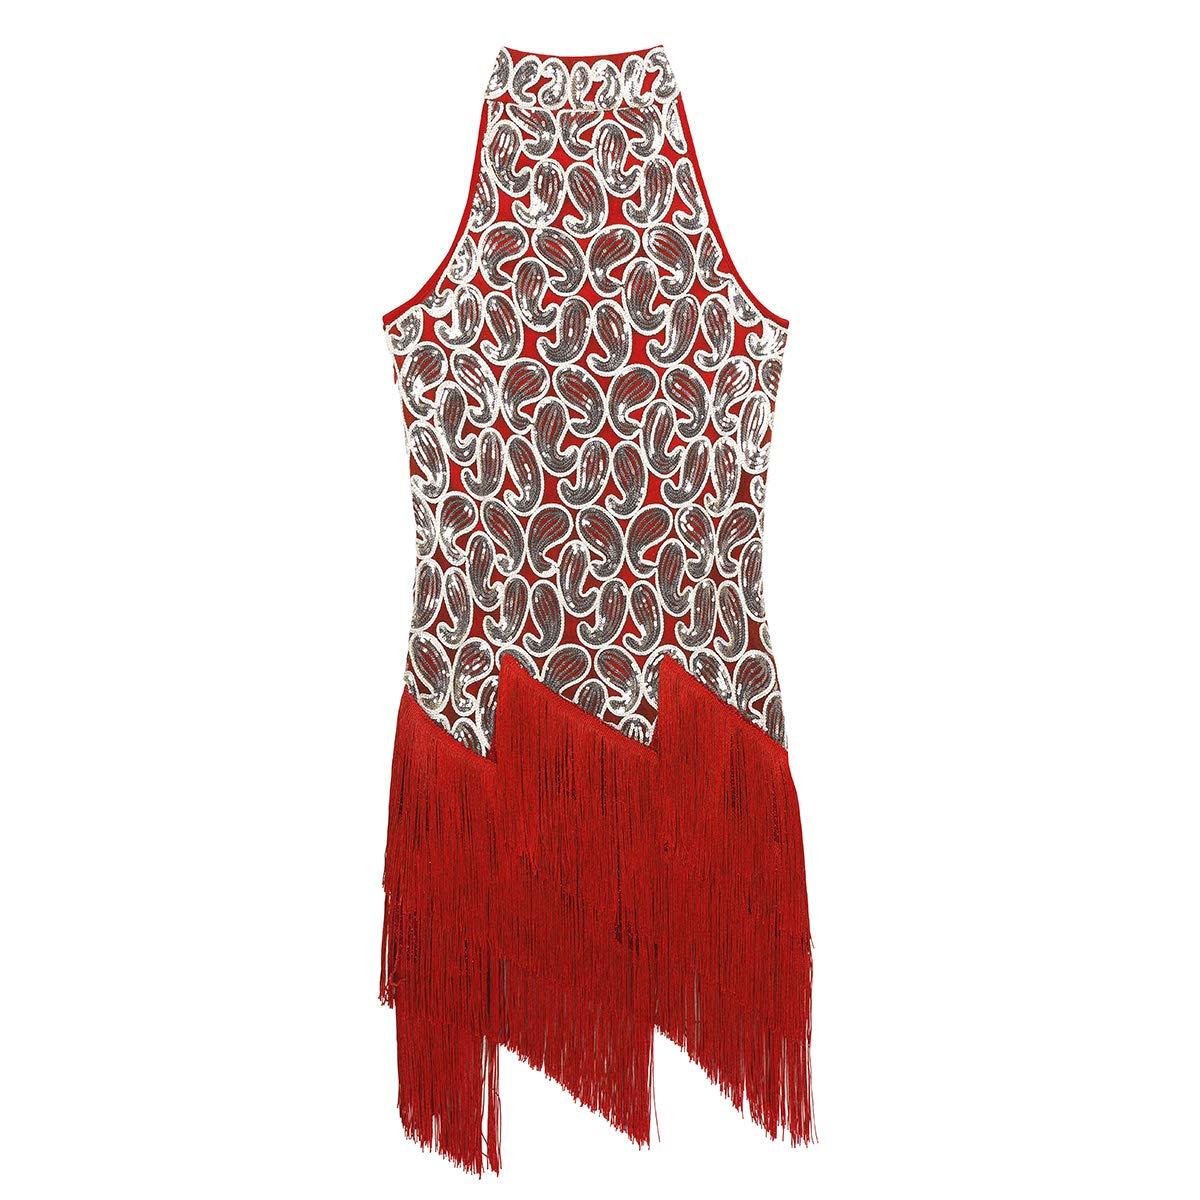 FEESHOW Latin Dance Dress Cha Cha Rhythm Ballroom Samba Rumba Tango Dress Sequins Fringe Dancewear